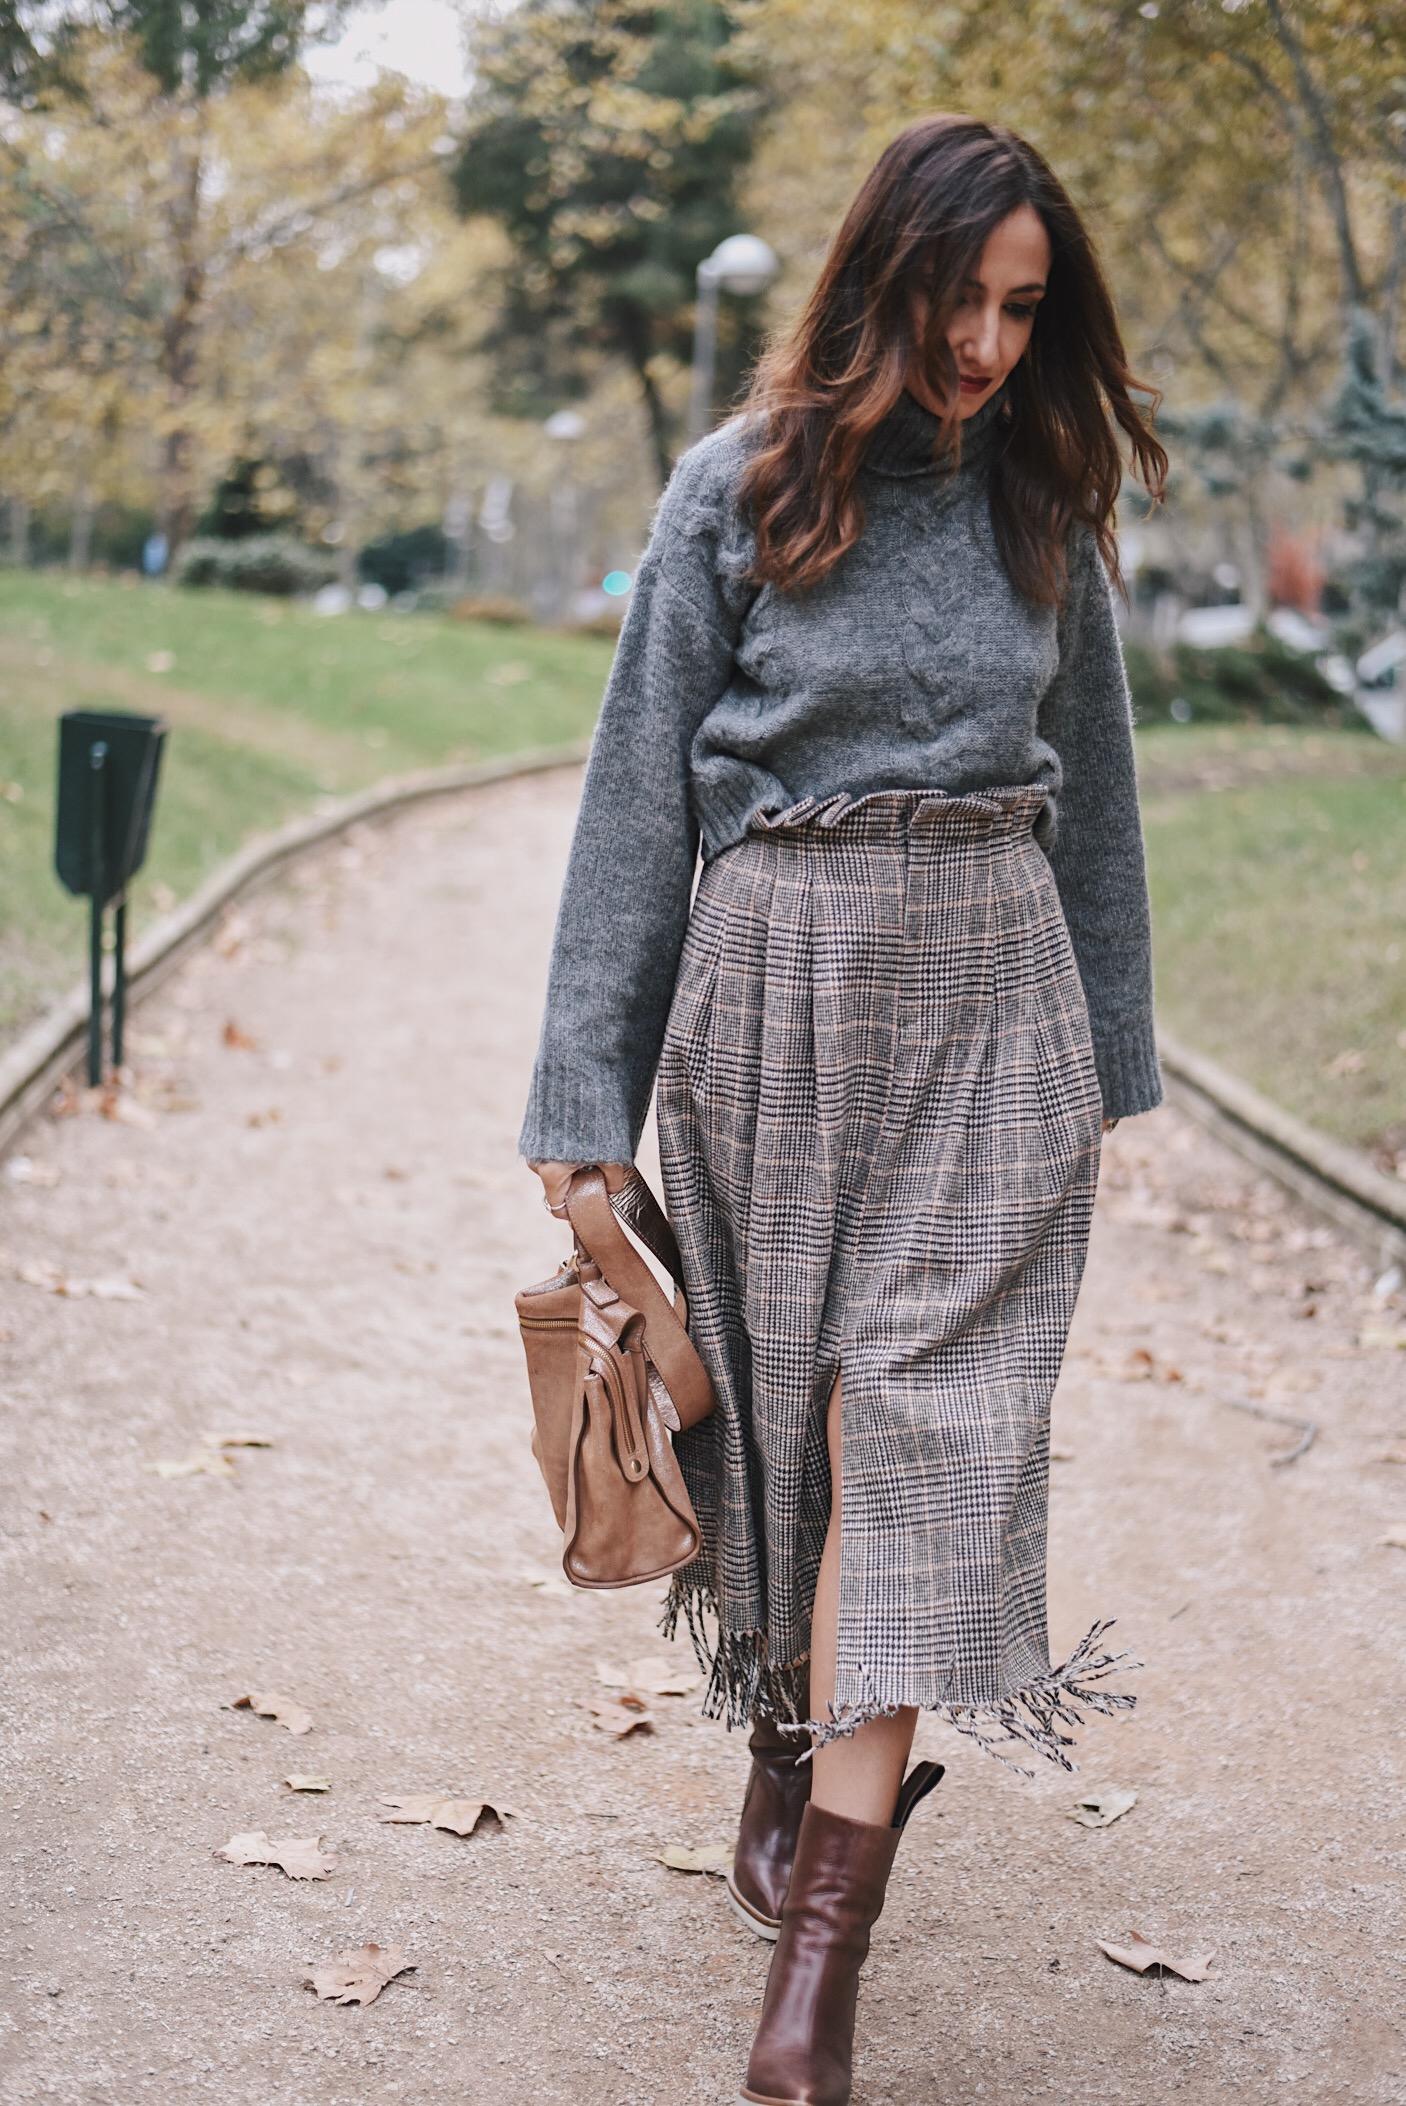 el-blog-de-silvia-rodriguez-abrigo-mostaza-pintini